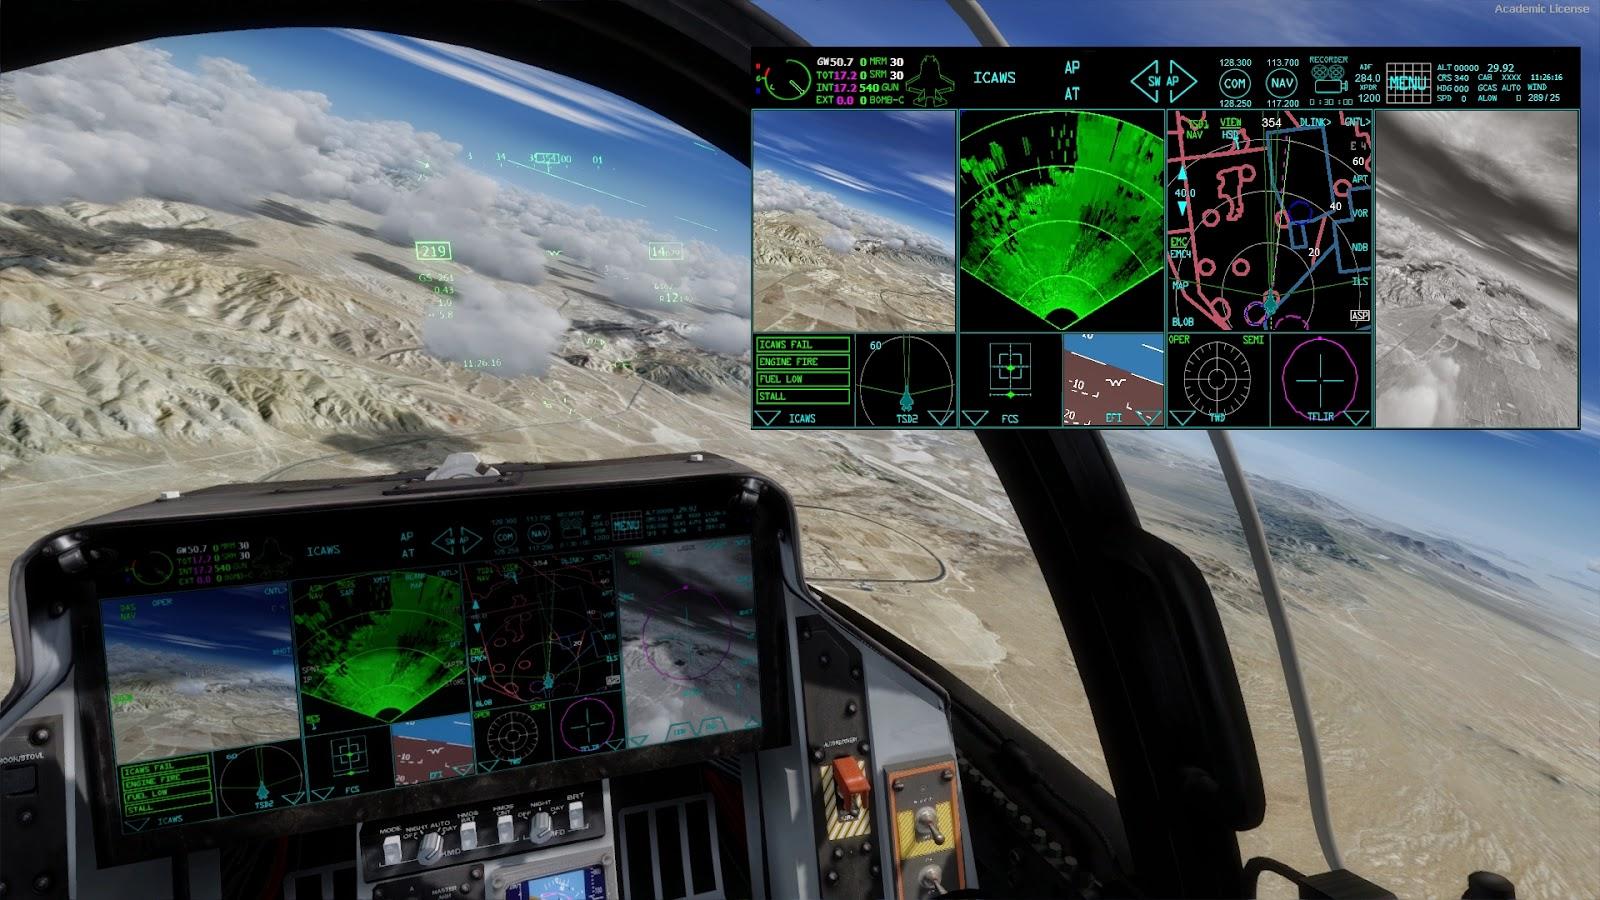 IndiaFoxtEcho Visual Simulations: March 2015